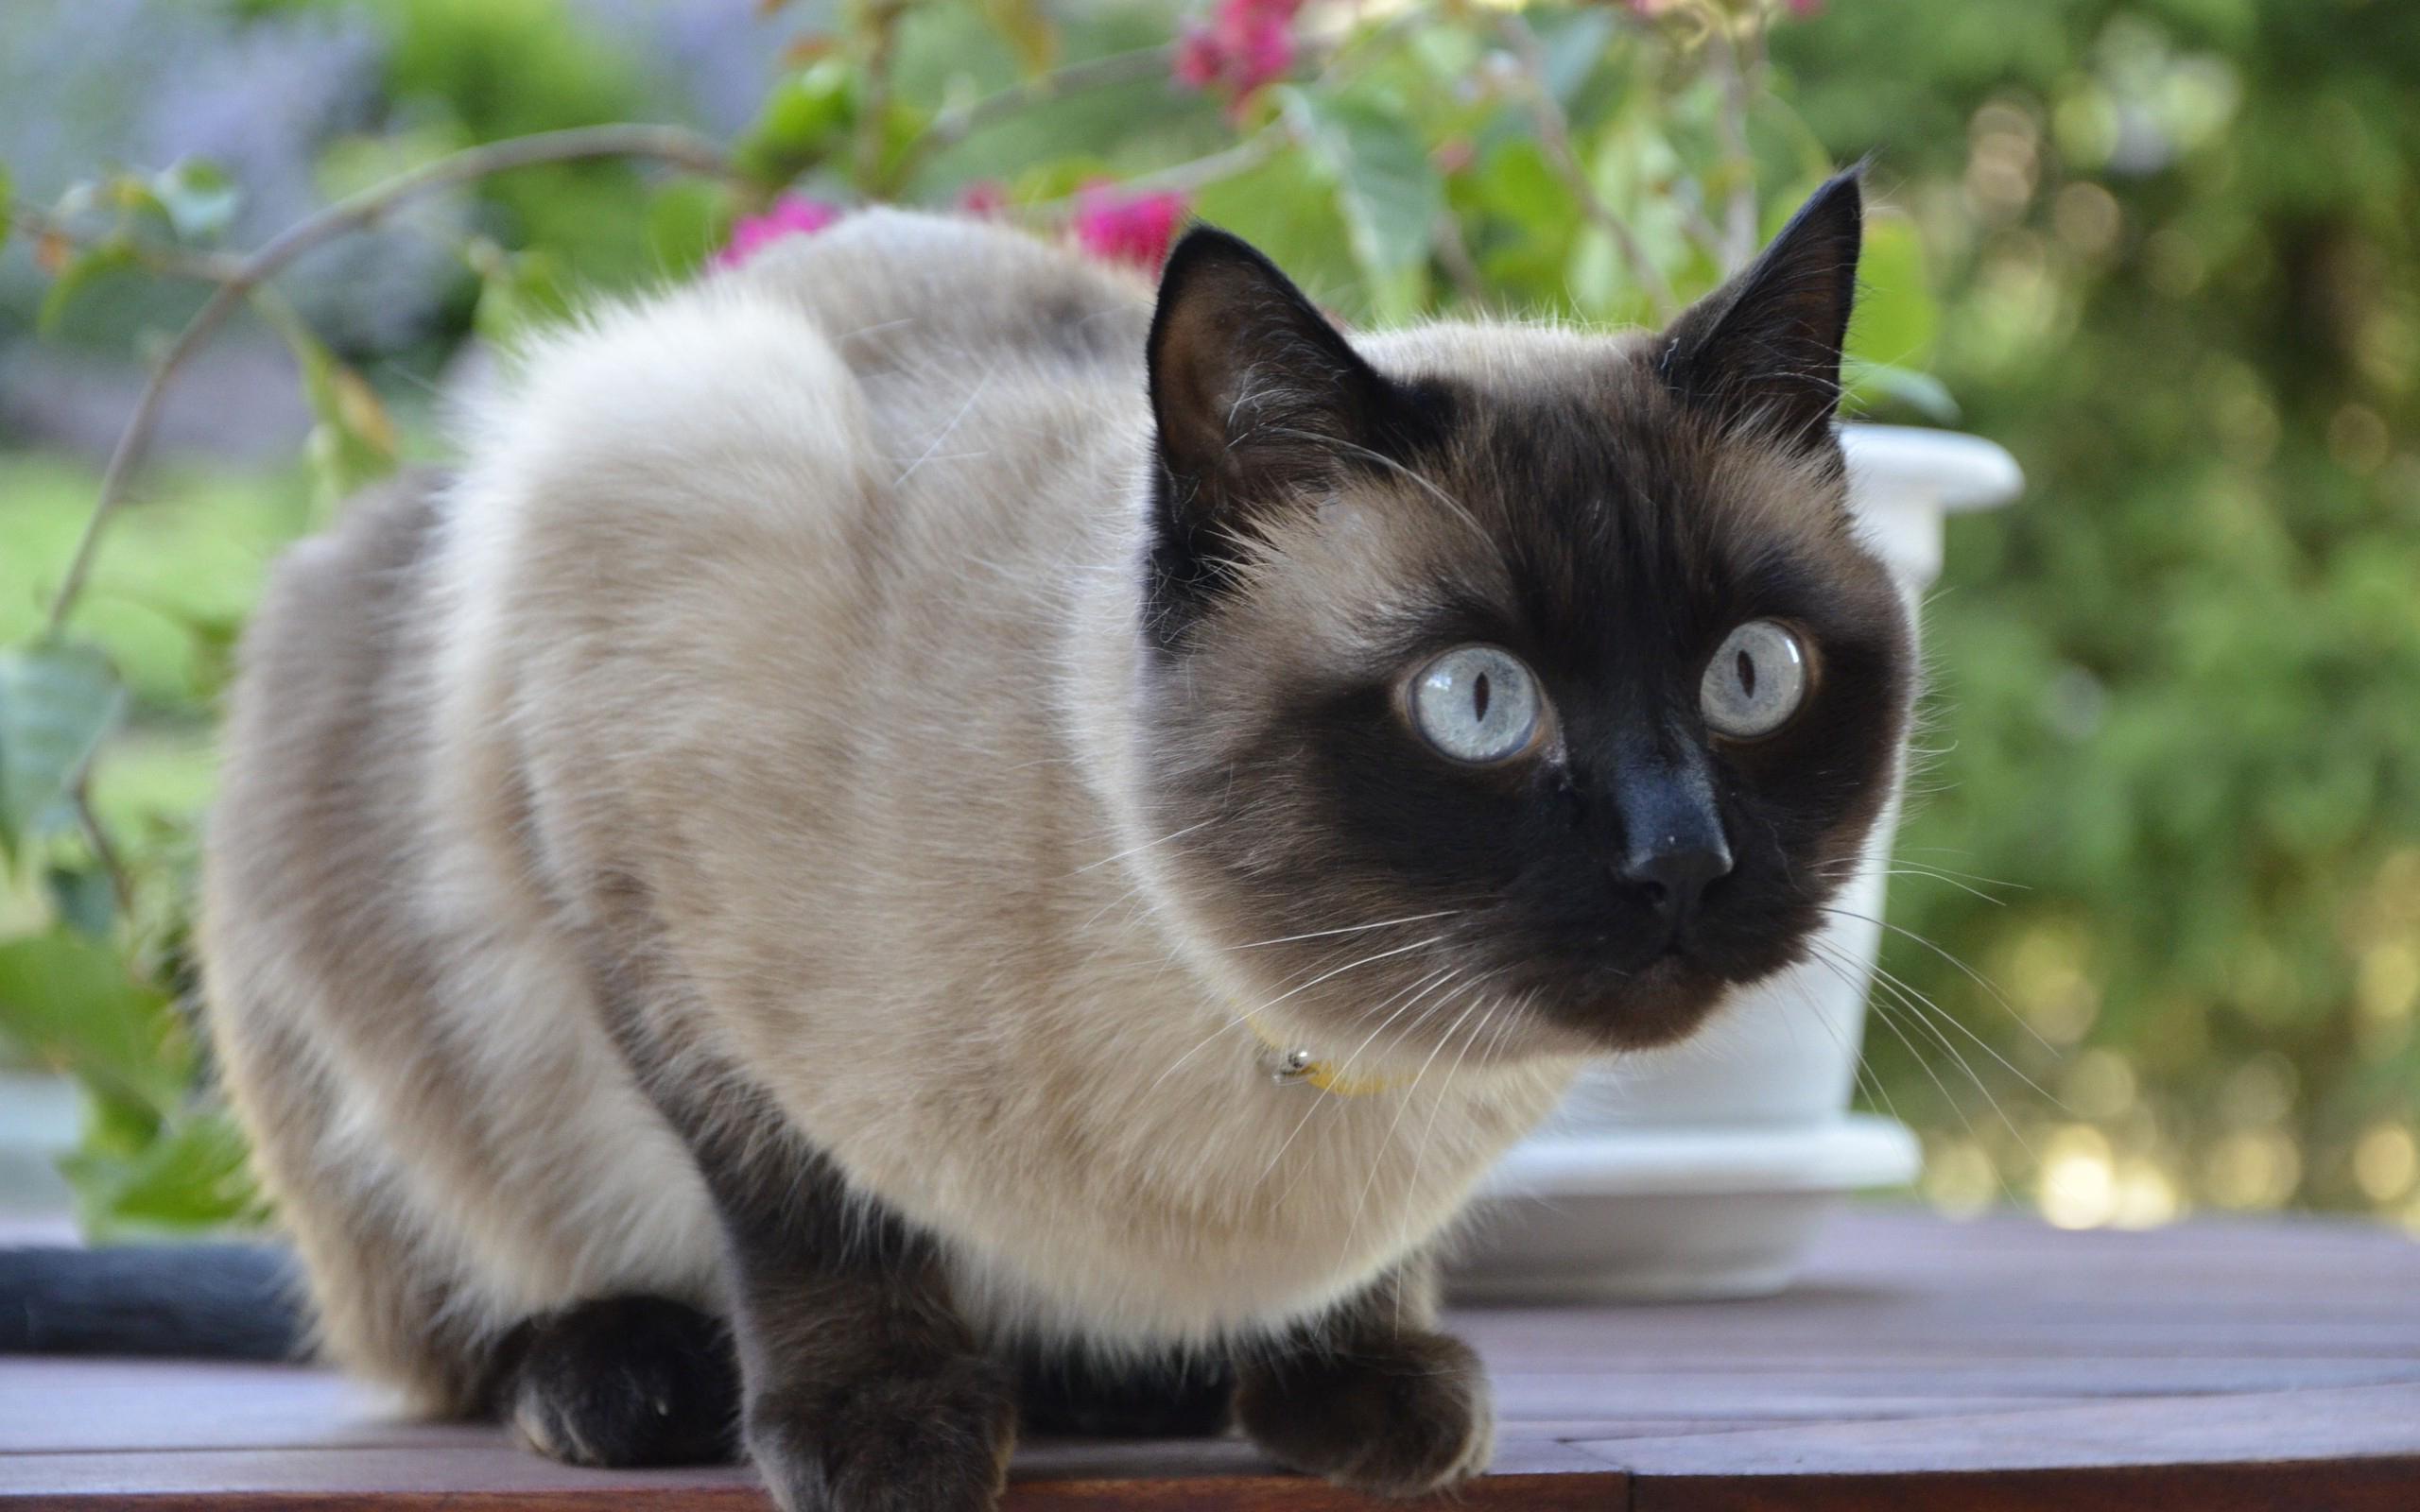 обои с сиамскими кошками на рабочий стол № 1074128 без смс